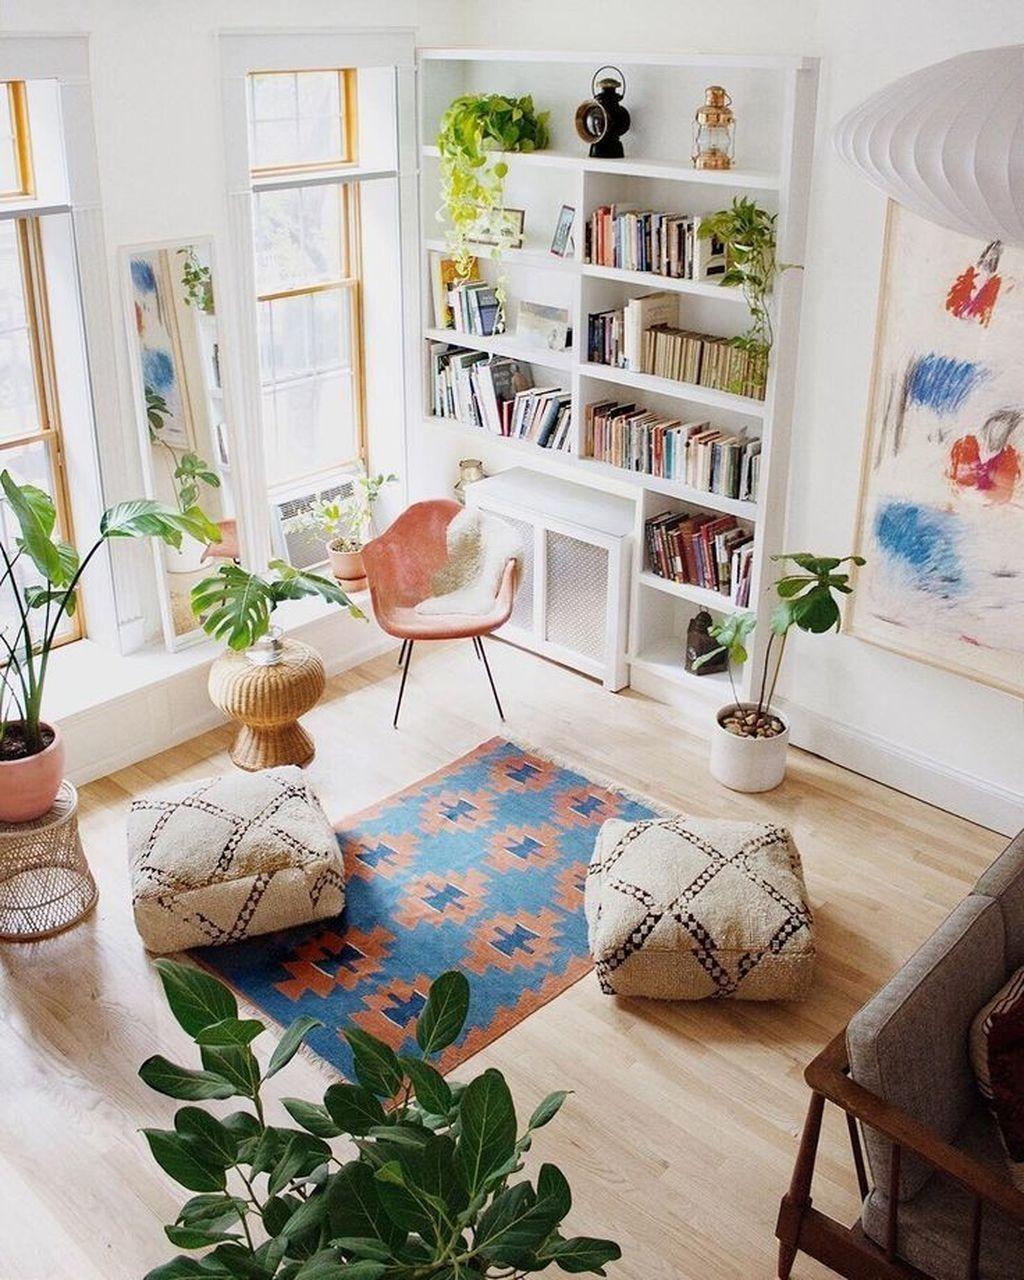 30 Hottest Scandinavian Design Ideas For Apartment Coodecor Living Room Scandinavian Scandinavian Design Living Room House Interior